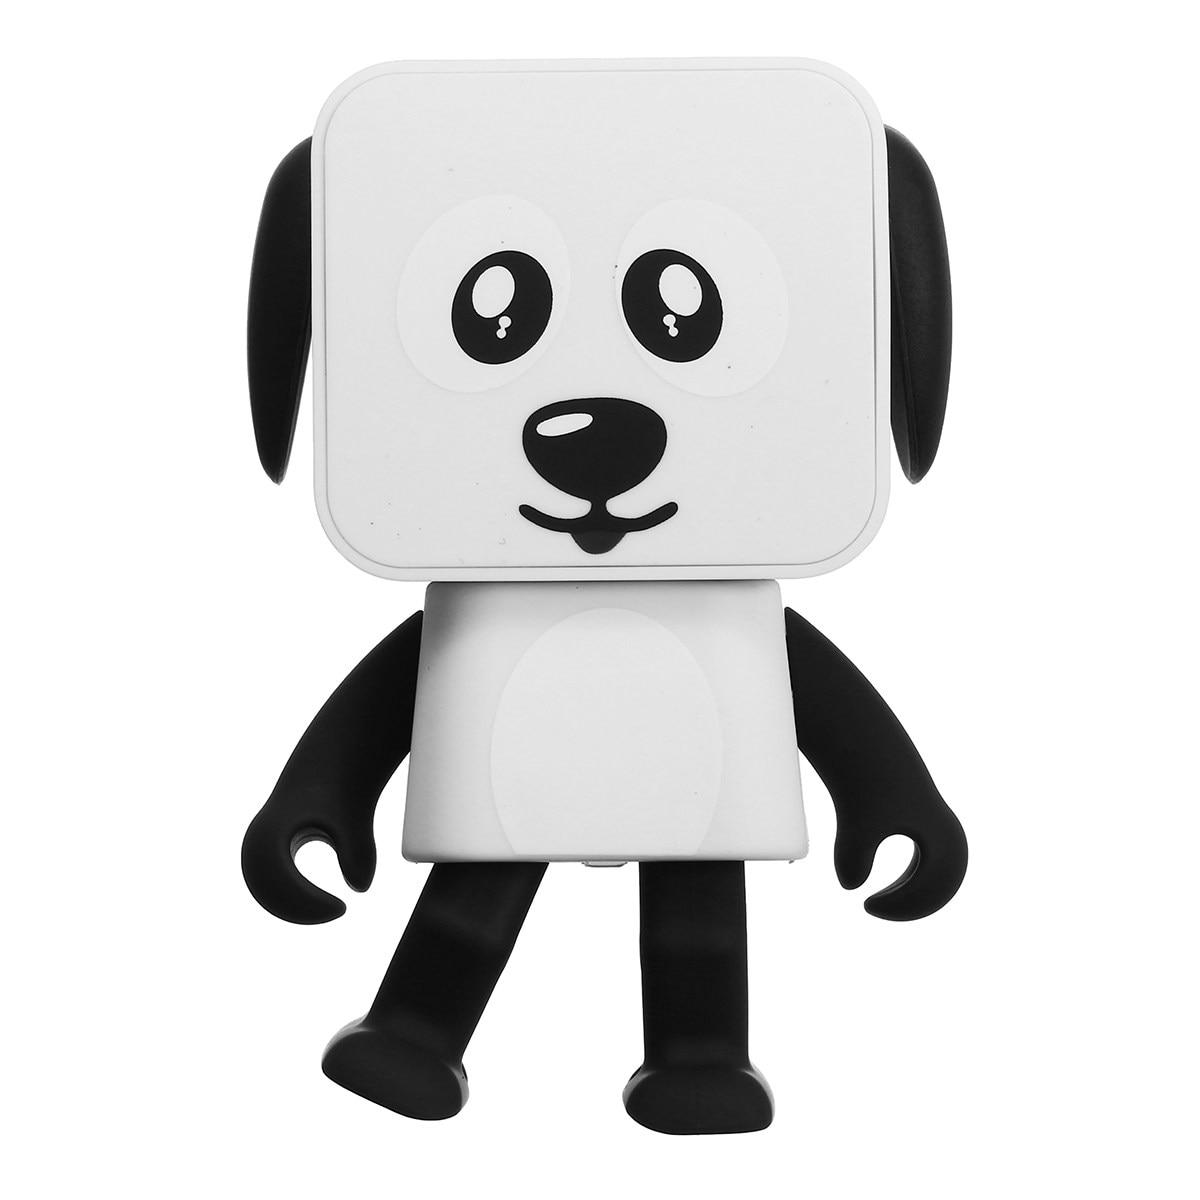 Portable Wireless Bluetooth Music Box Dancing Robot Speaker Stereo Loudspeaker For Phone/PC/MP3/Macbooks Cute Gift For Children